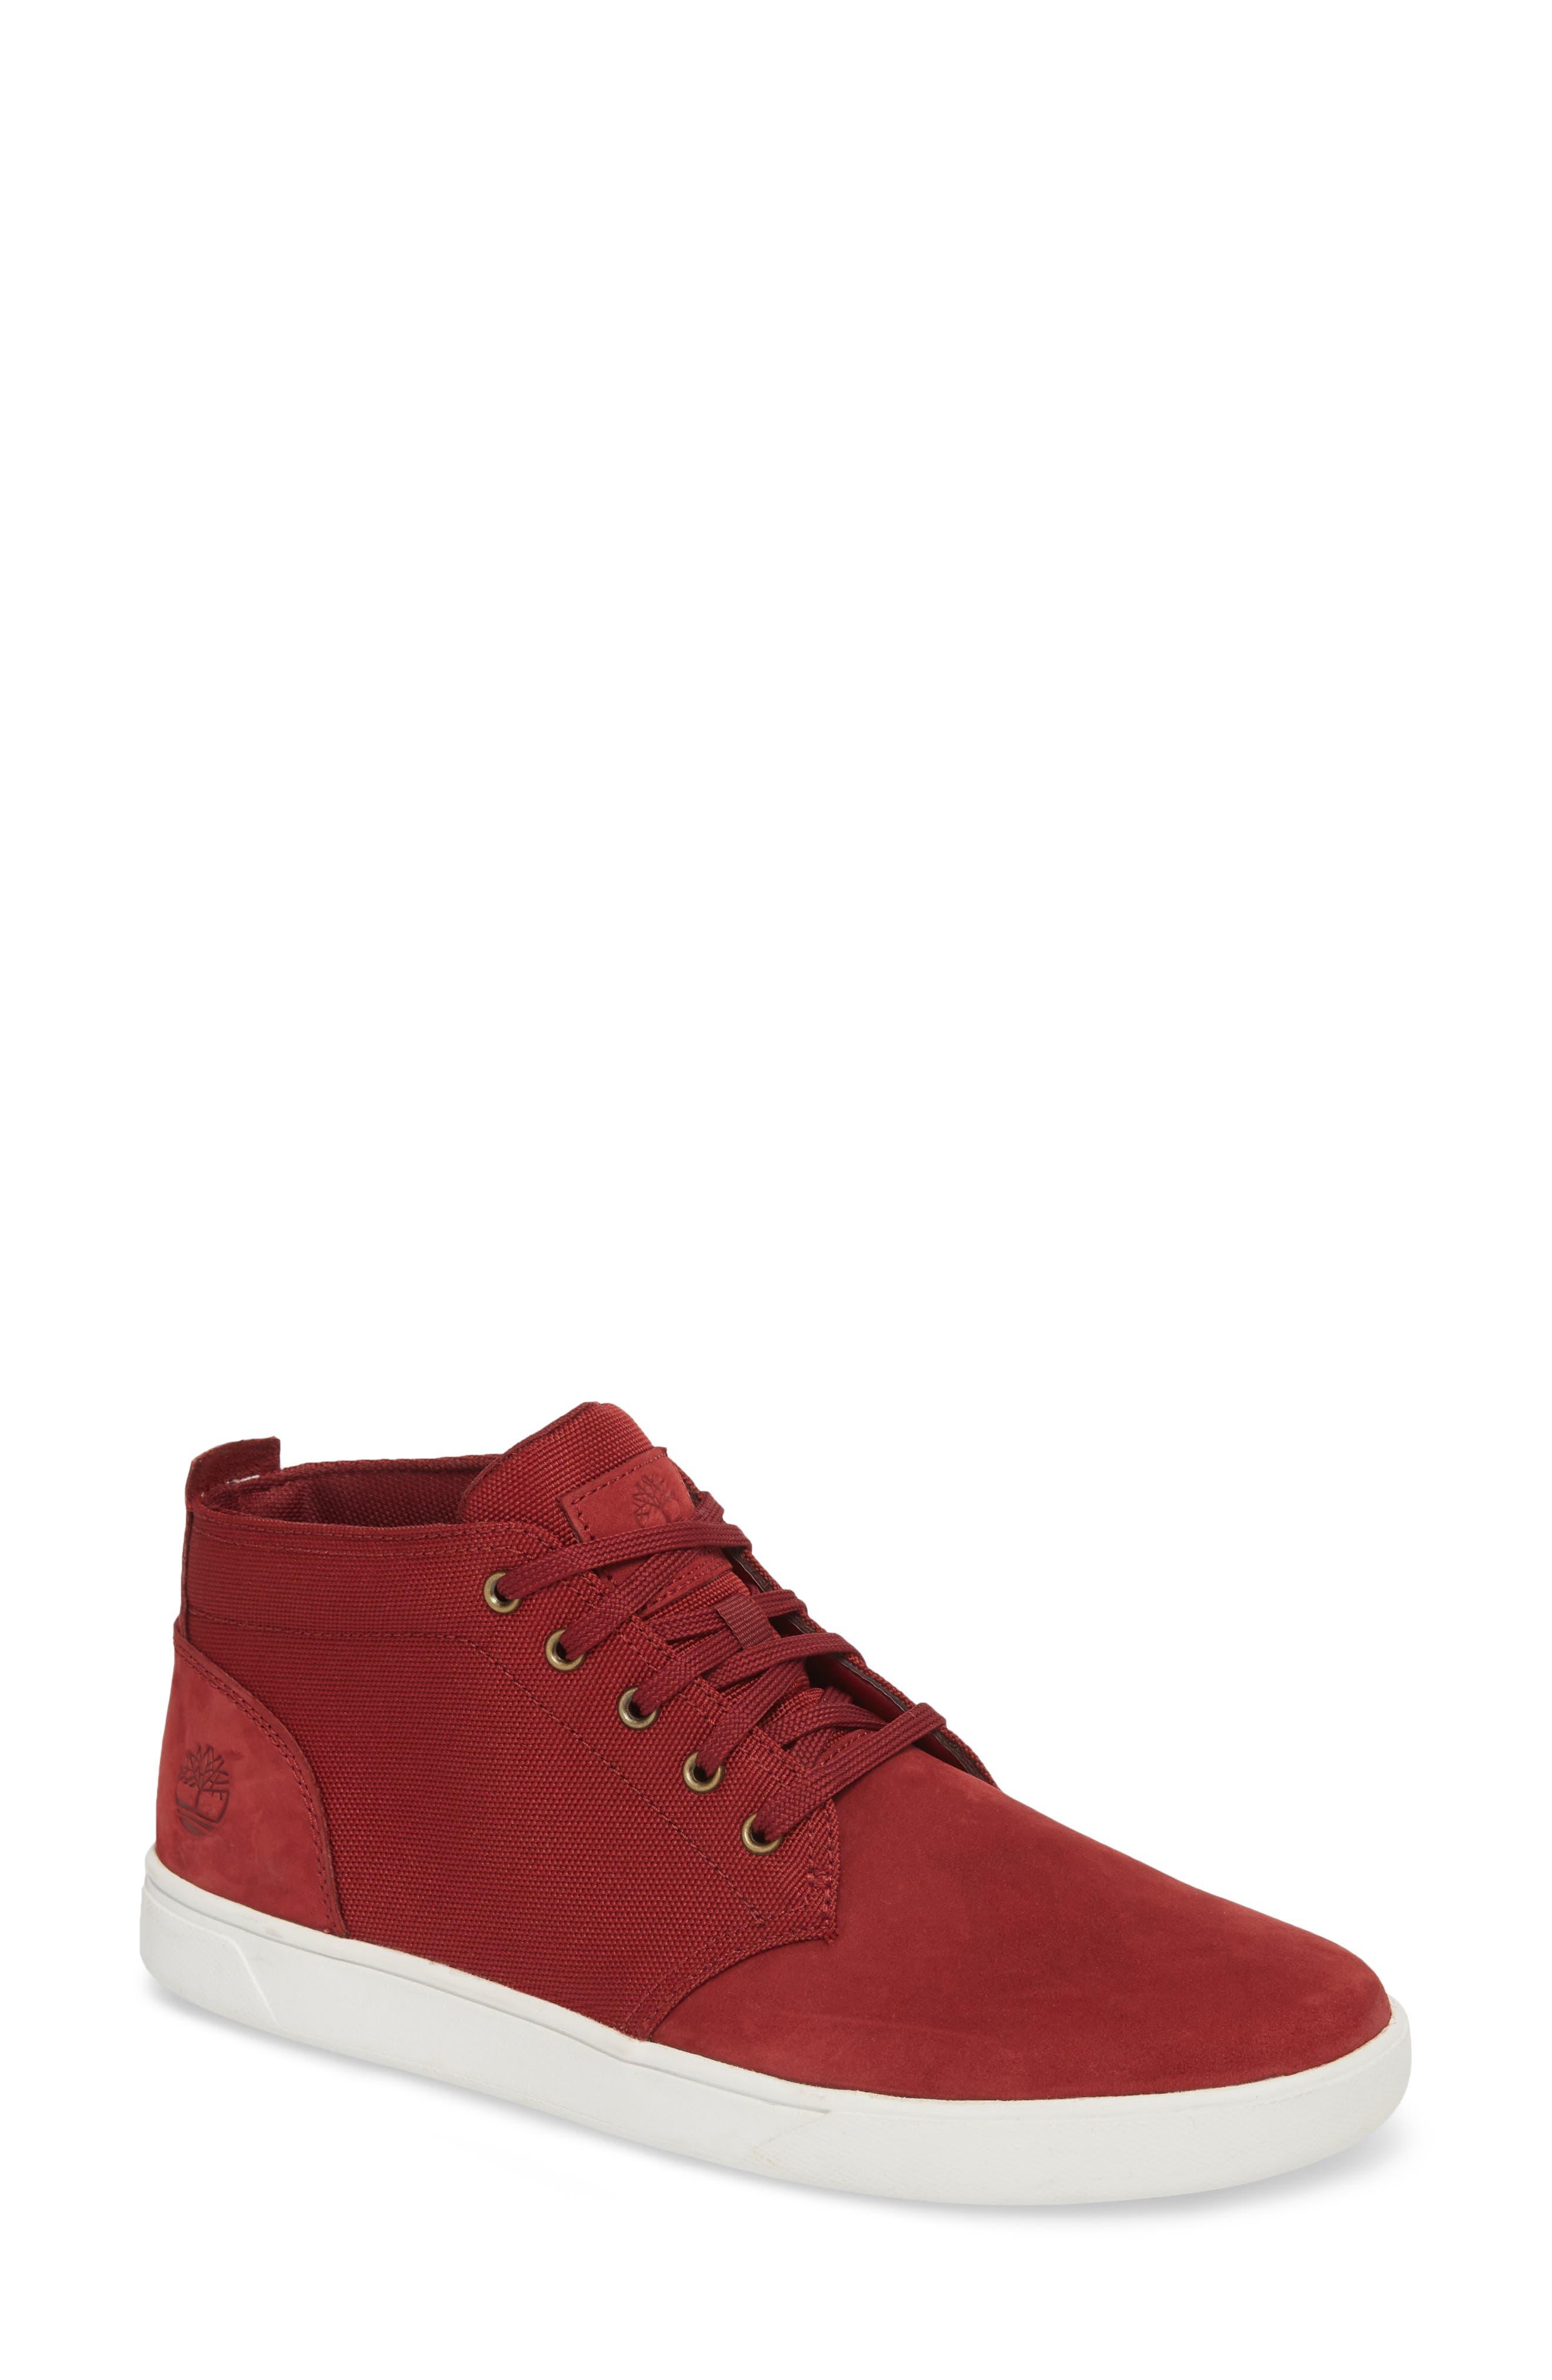 Earthkeepers<sup>™</sup> 'Groveton' Chukka Sneaker,                         Main,                         color, POMEGRANATE NUBUCK